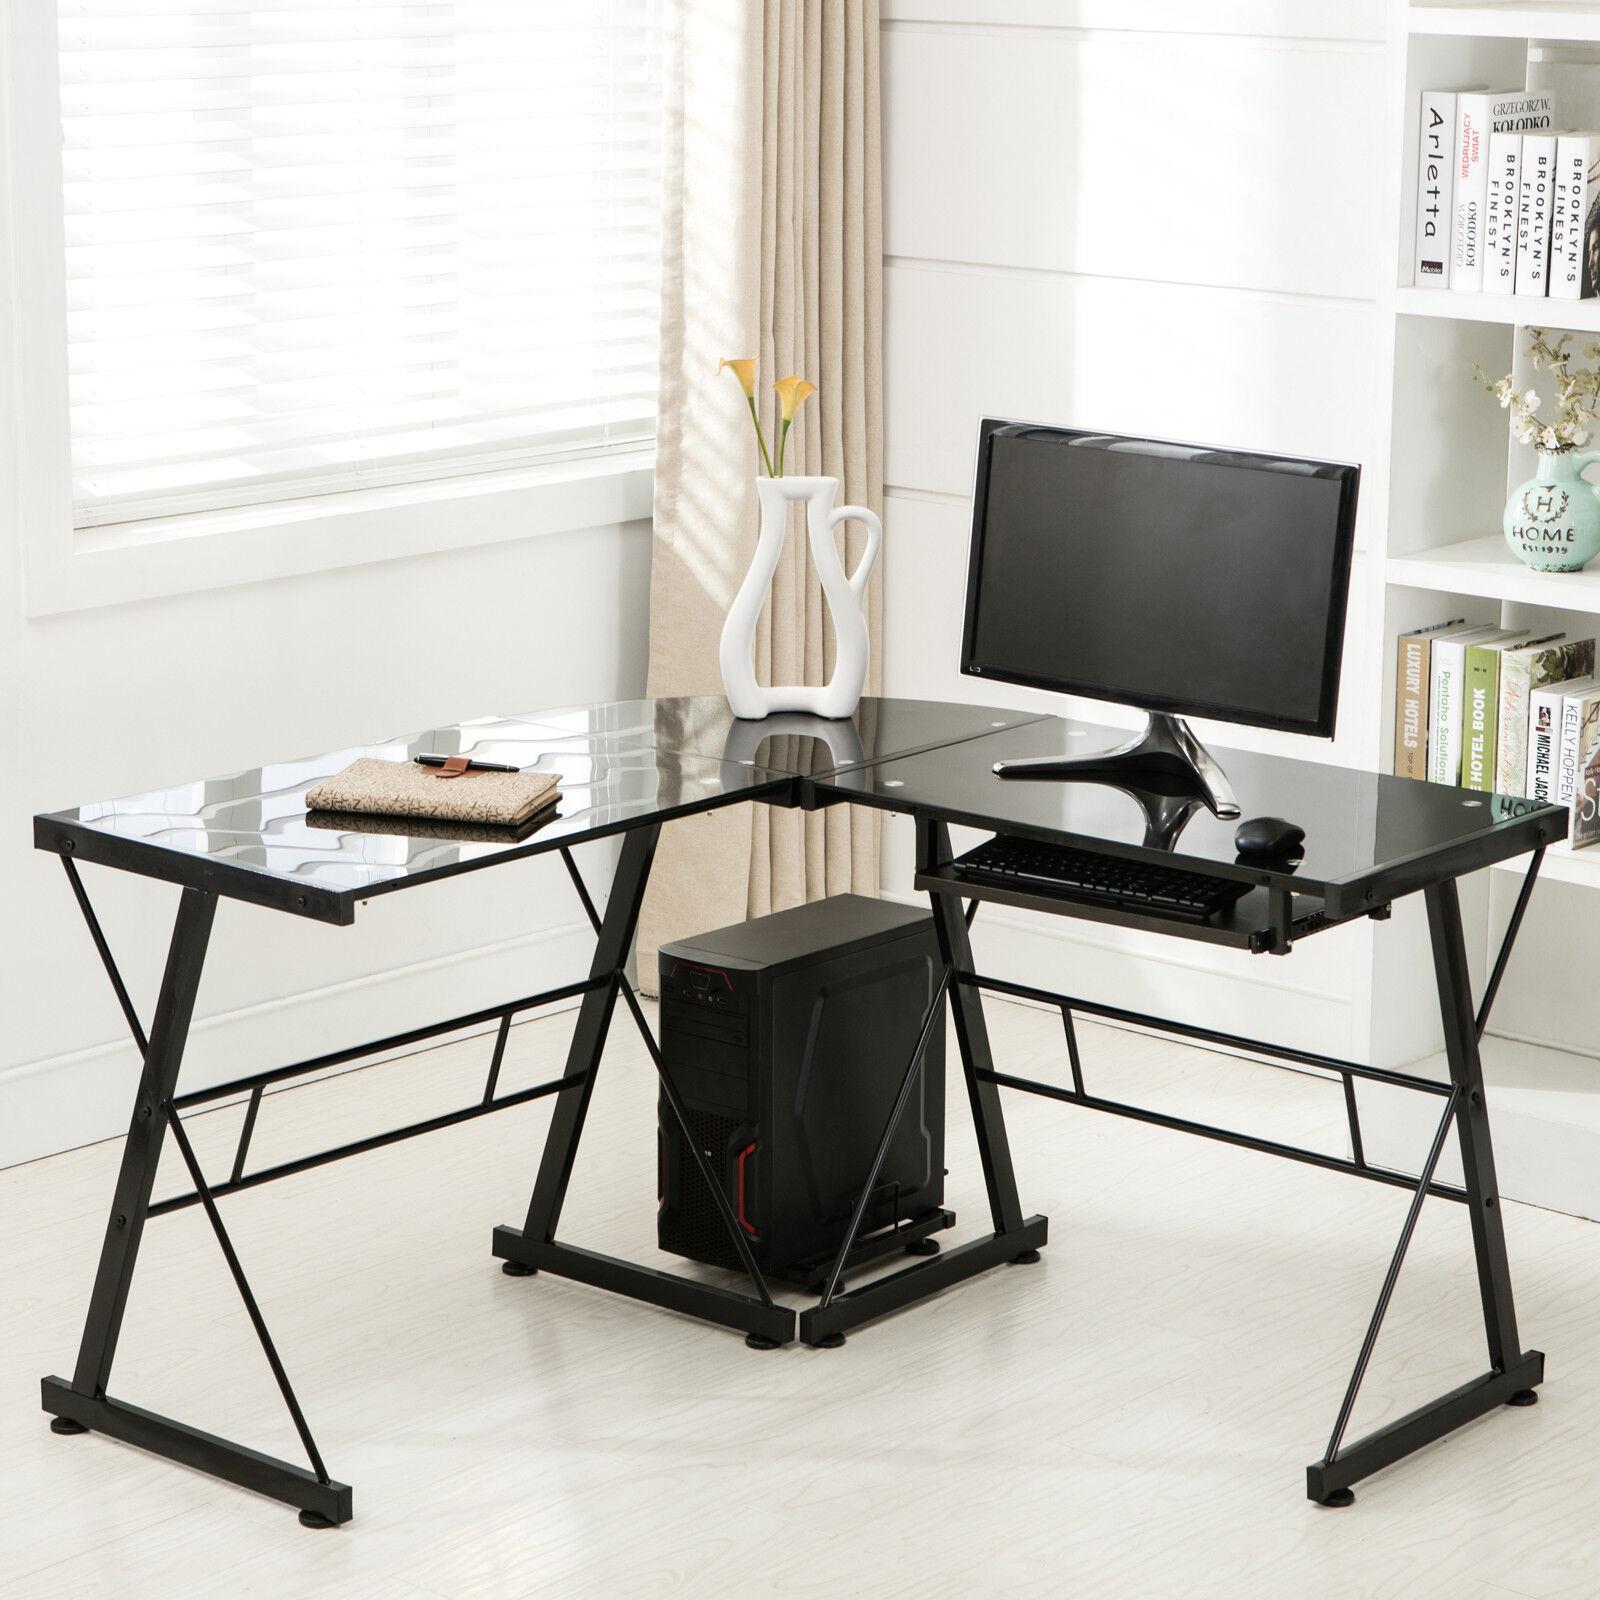 Charmant Black L Shape Glass Corner Computer Desk Laptop PC Table Workstation Home  Office